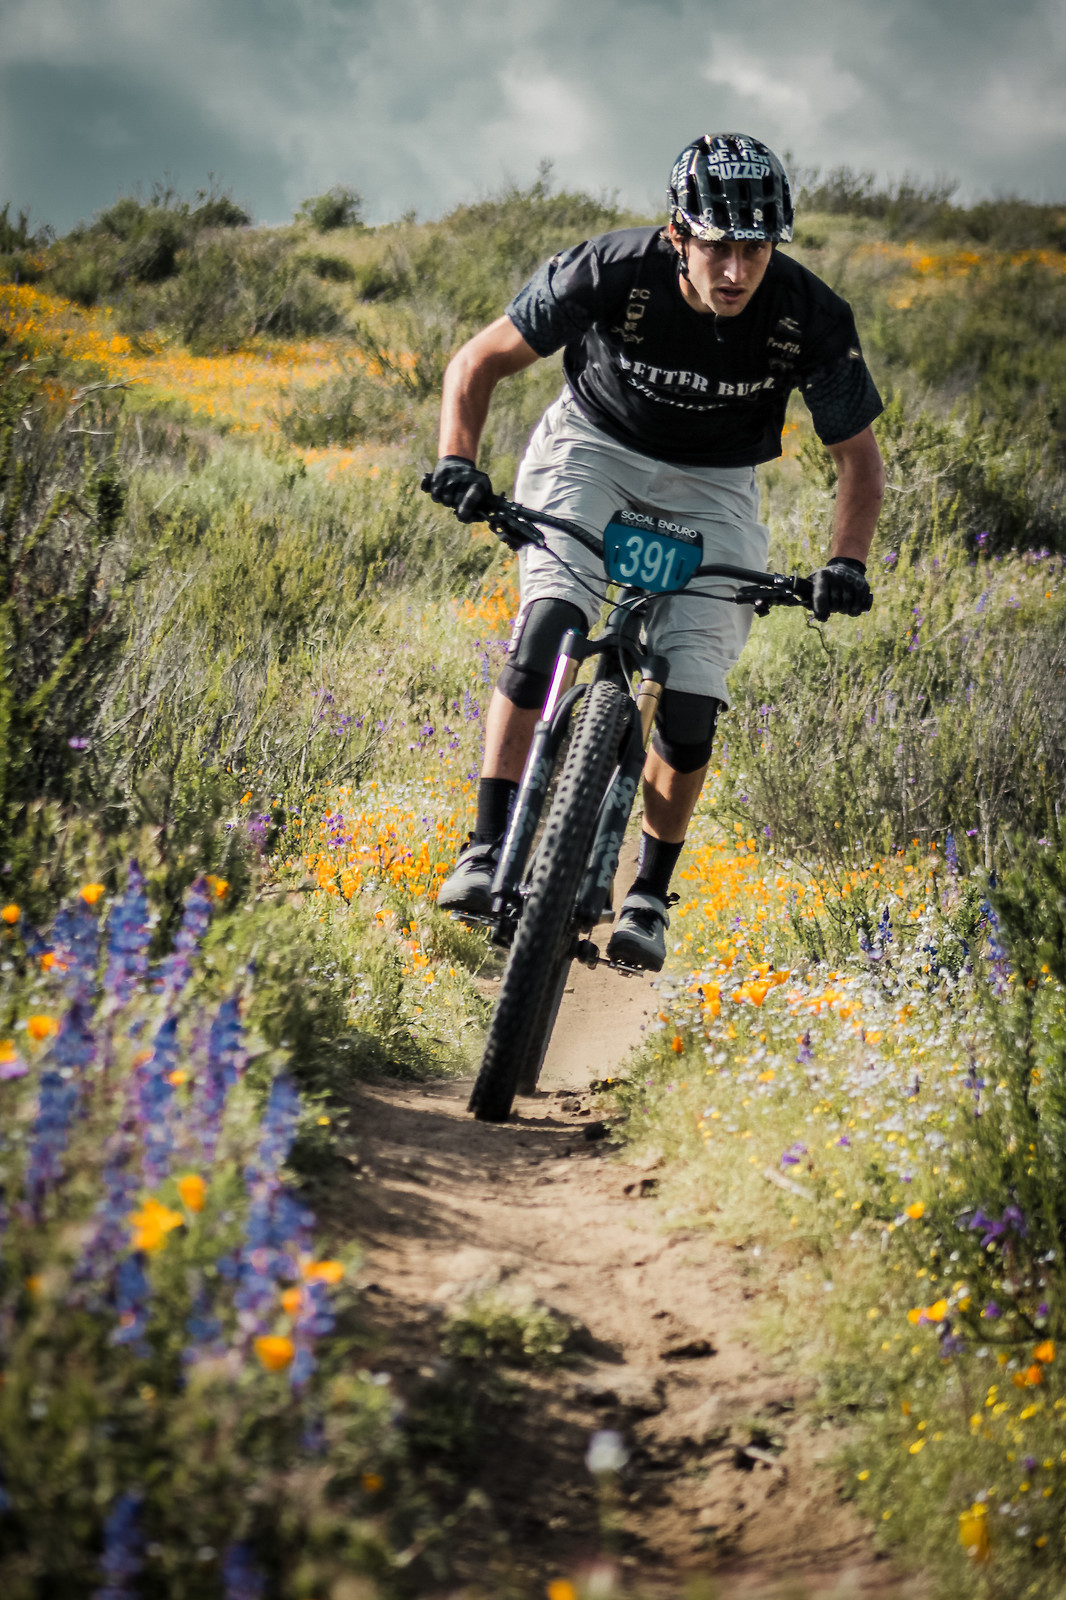 IMG 2055 - Liam Donohue - Mountain Biking Pictures - Vital MTB